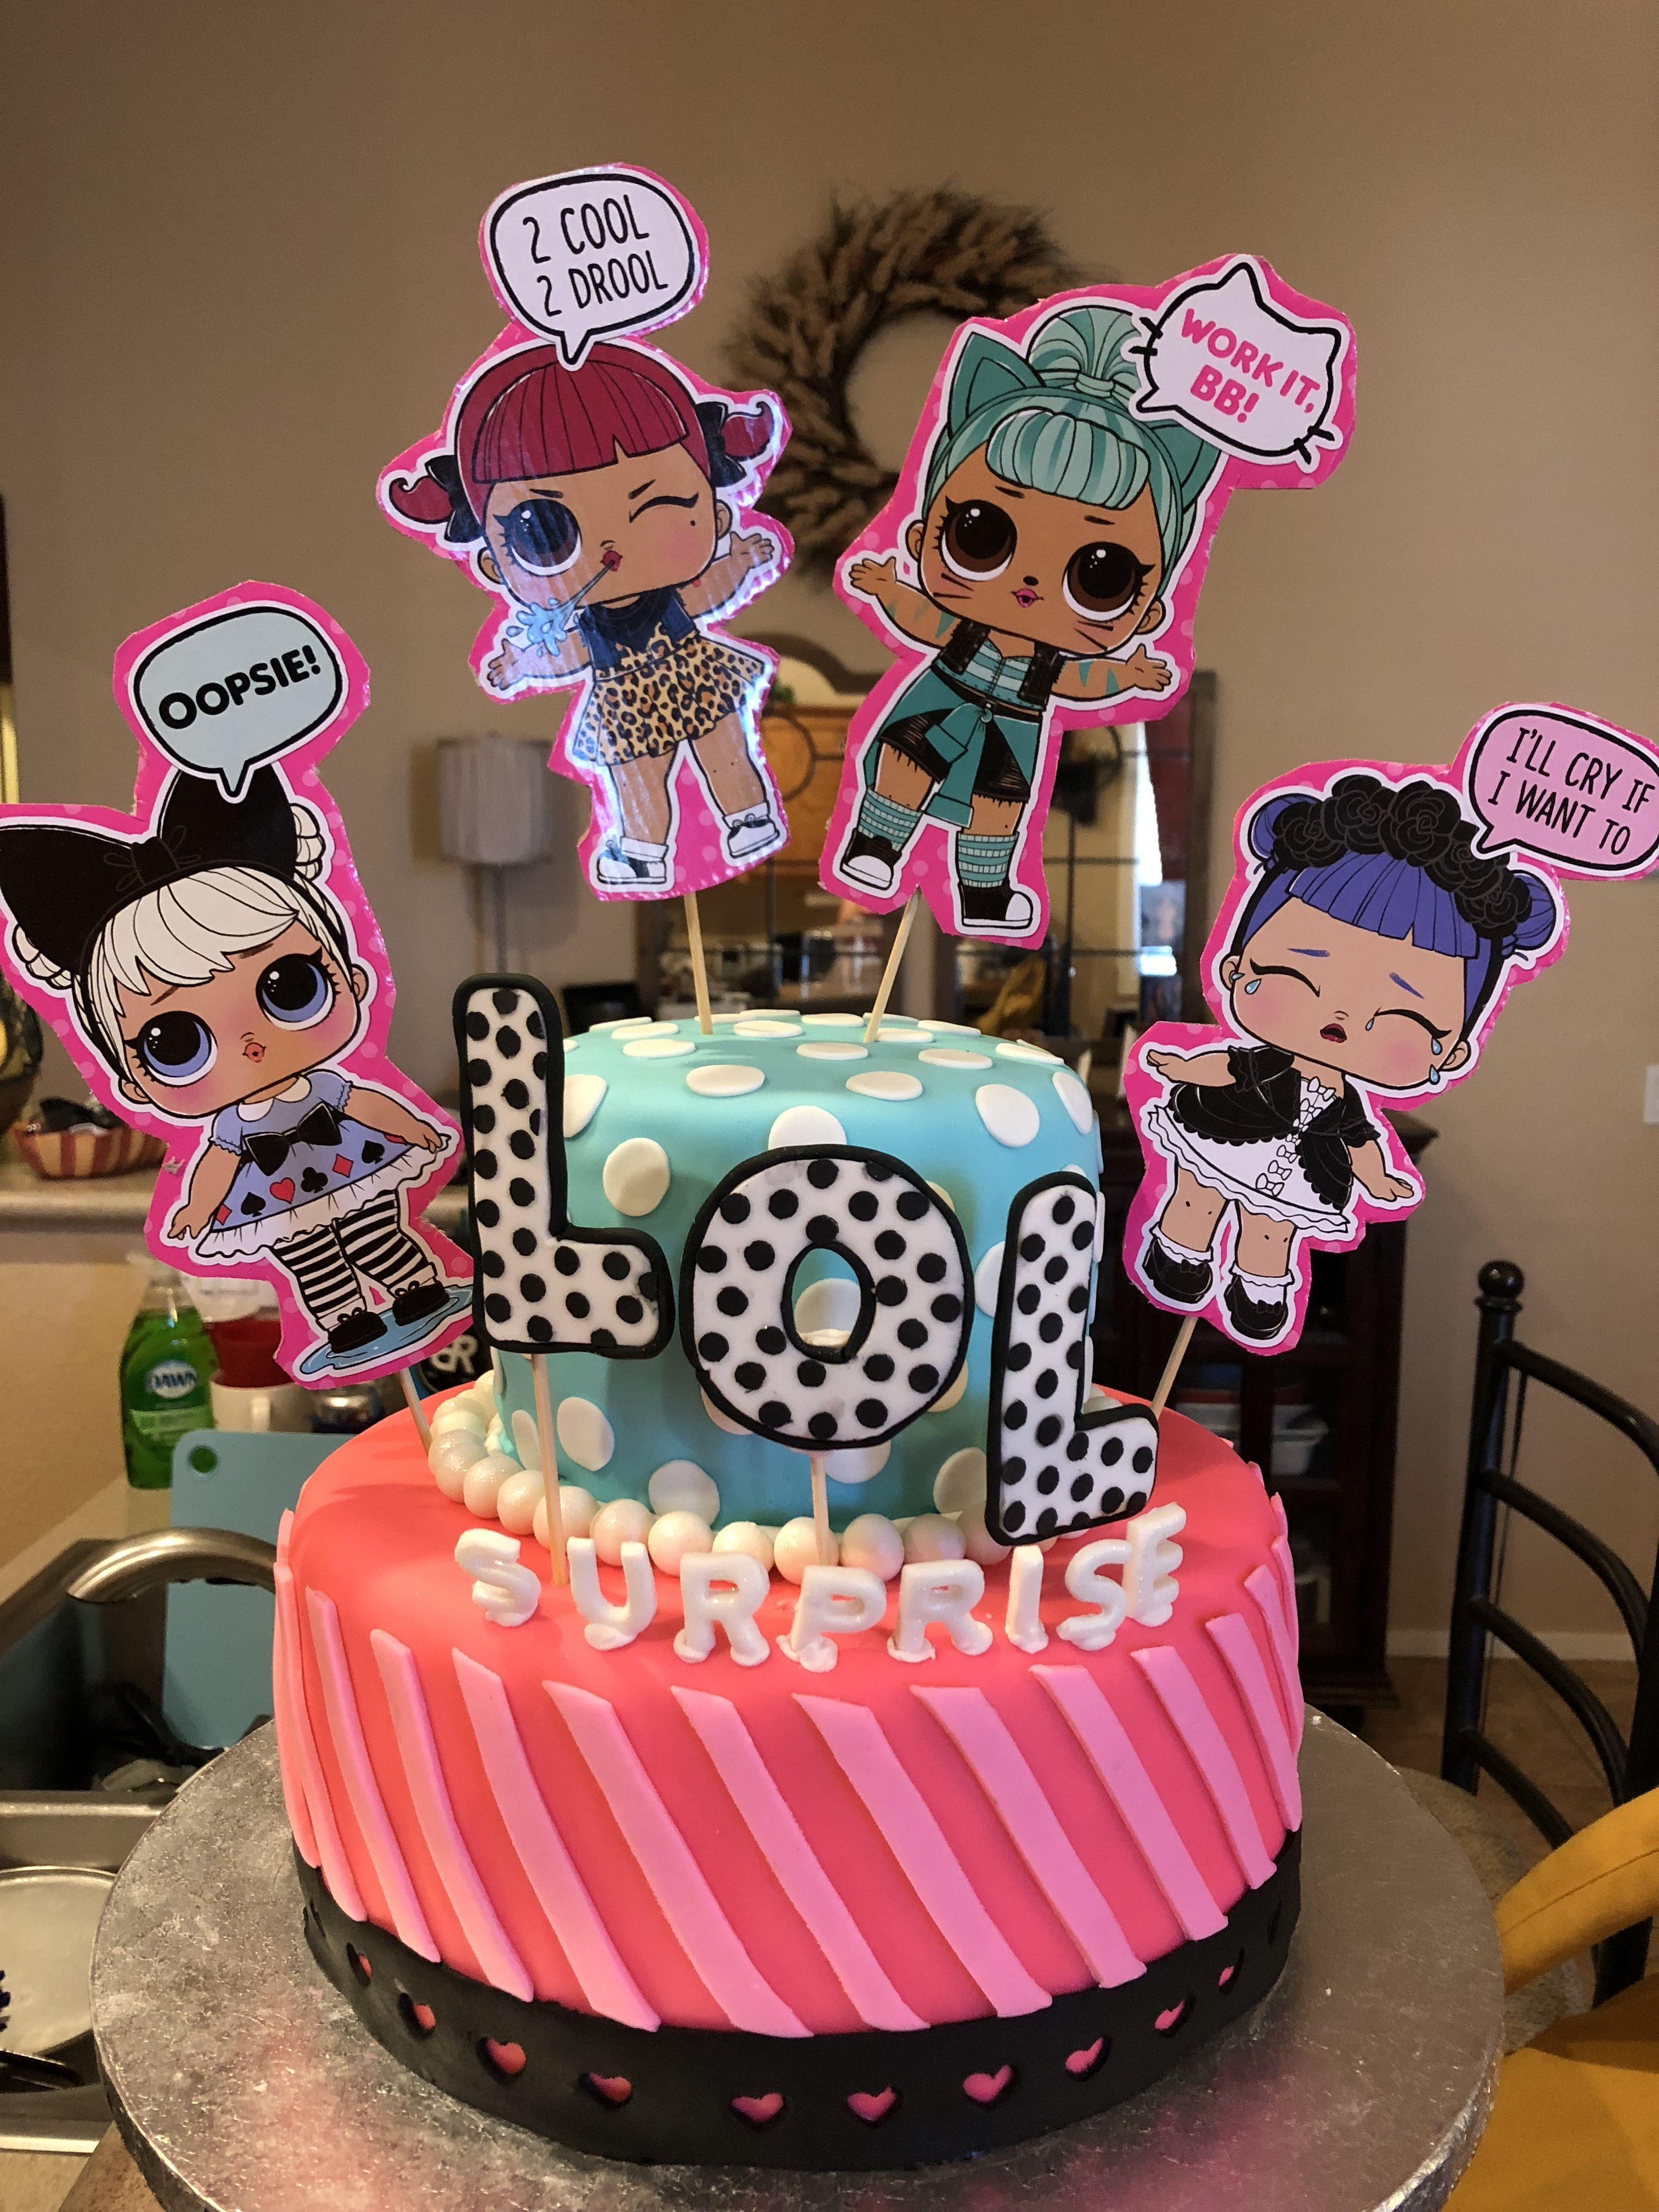 Lol Suprise Birthday Cake Lol Doll Cake Suprise Birthday Girly Birthday Party